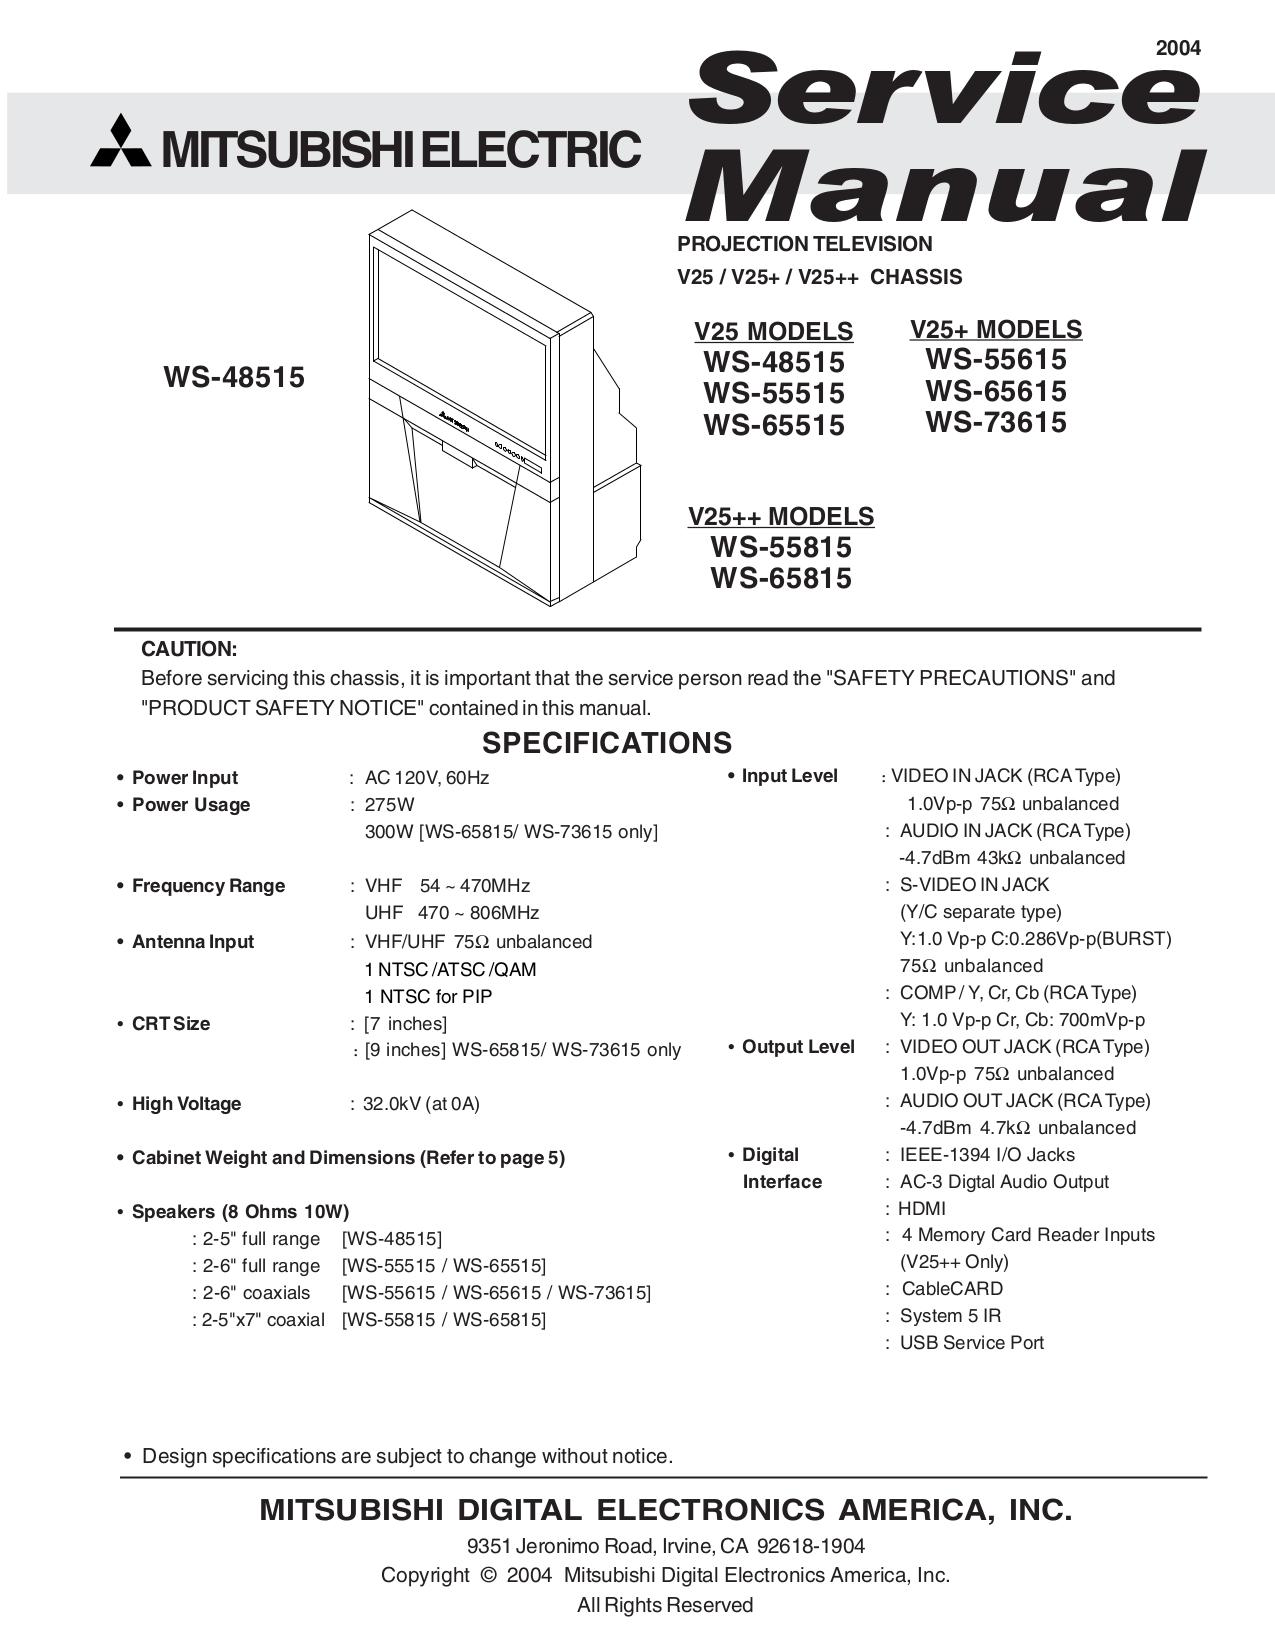 manual mitsubishi tv daily instruction manual guides u2022 rh testingwordpress co manual for mitsubishi tv wd-60735 manual for mitsubishi tv wd-65737